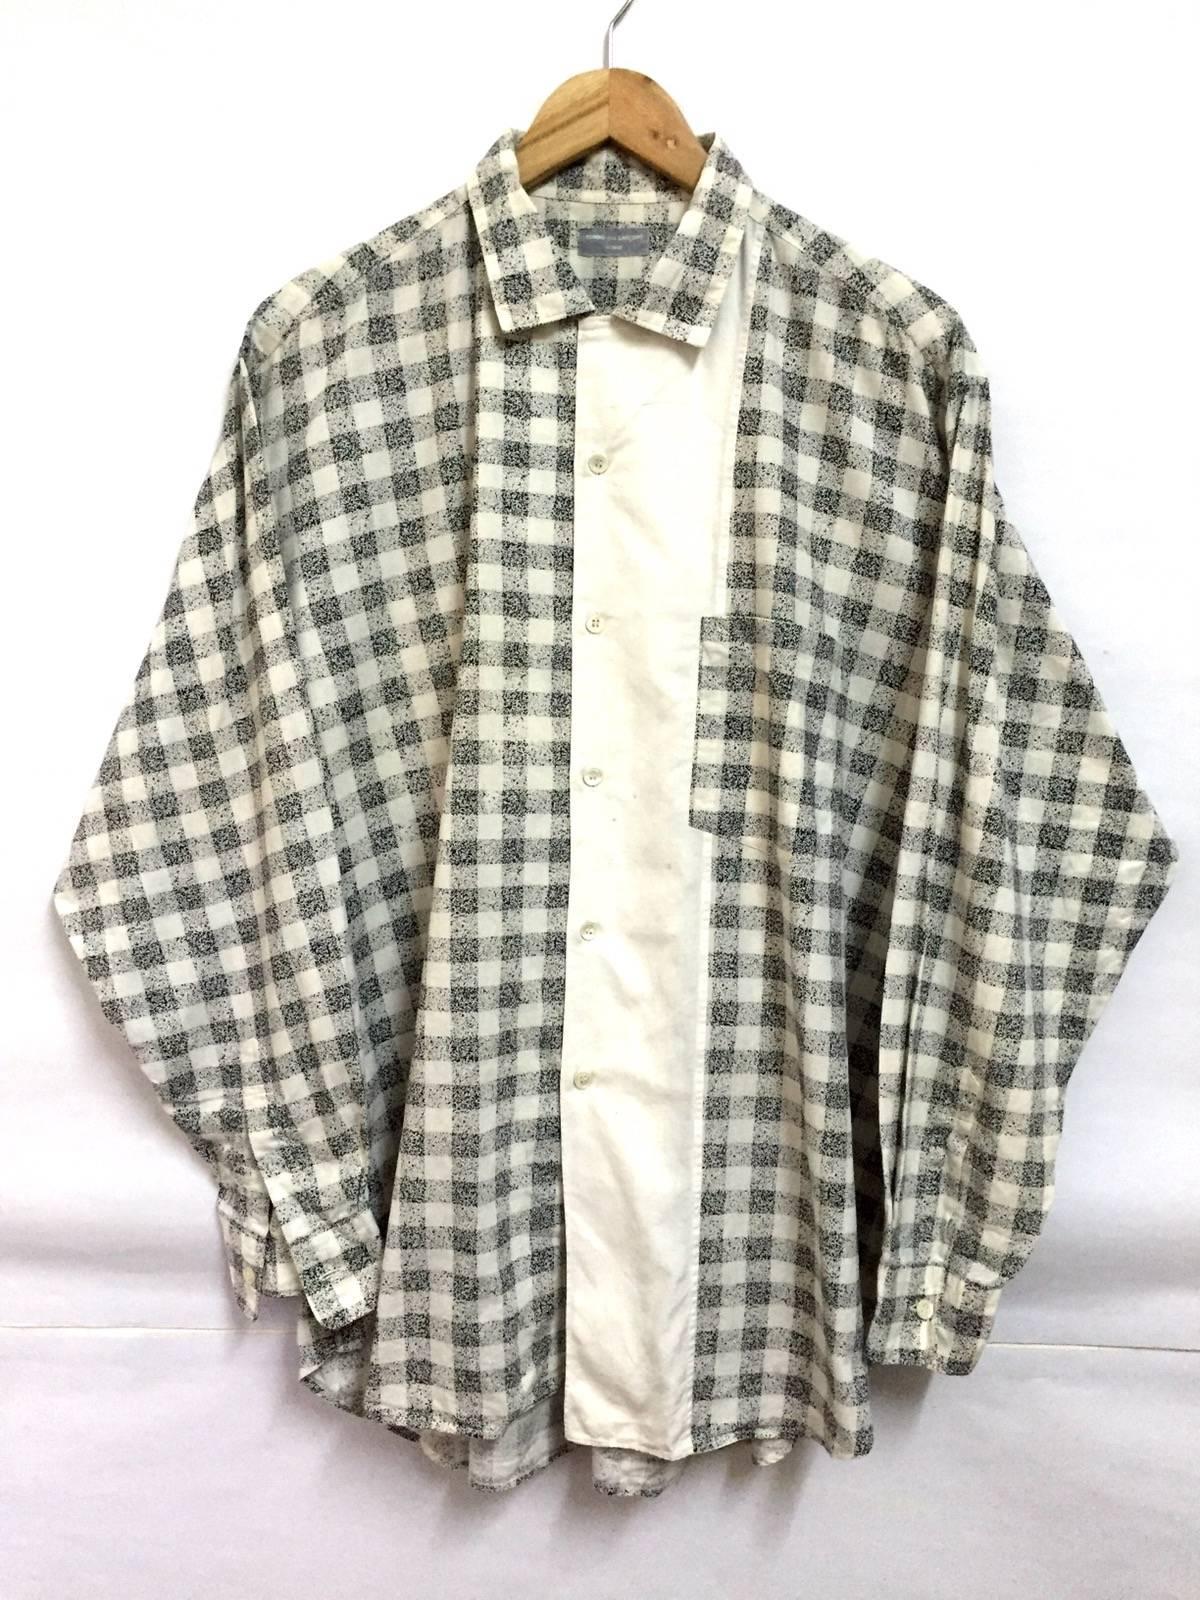 Black And White Checkered Shirt Plus Size | Lixnet AG